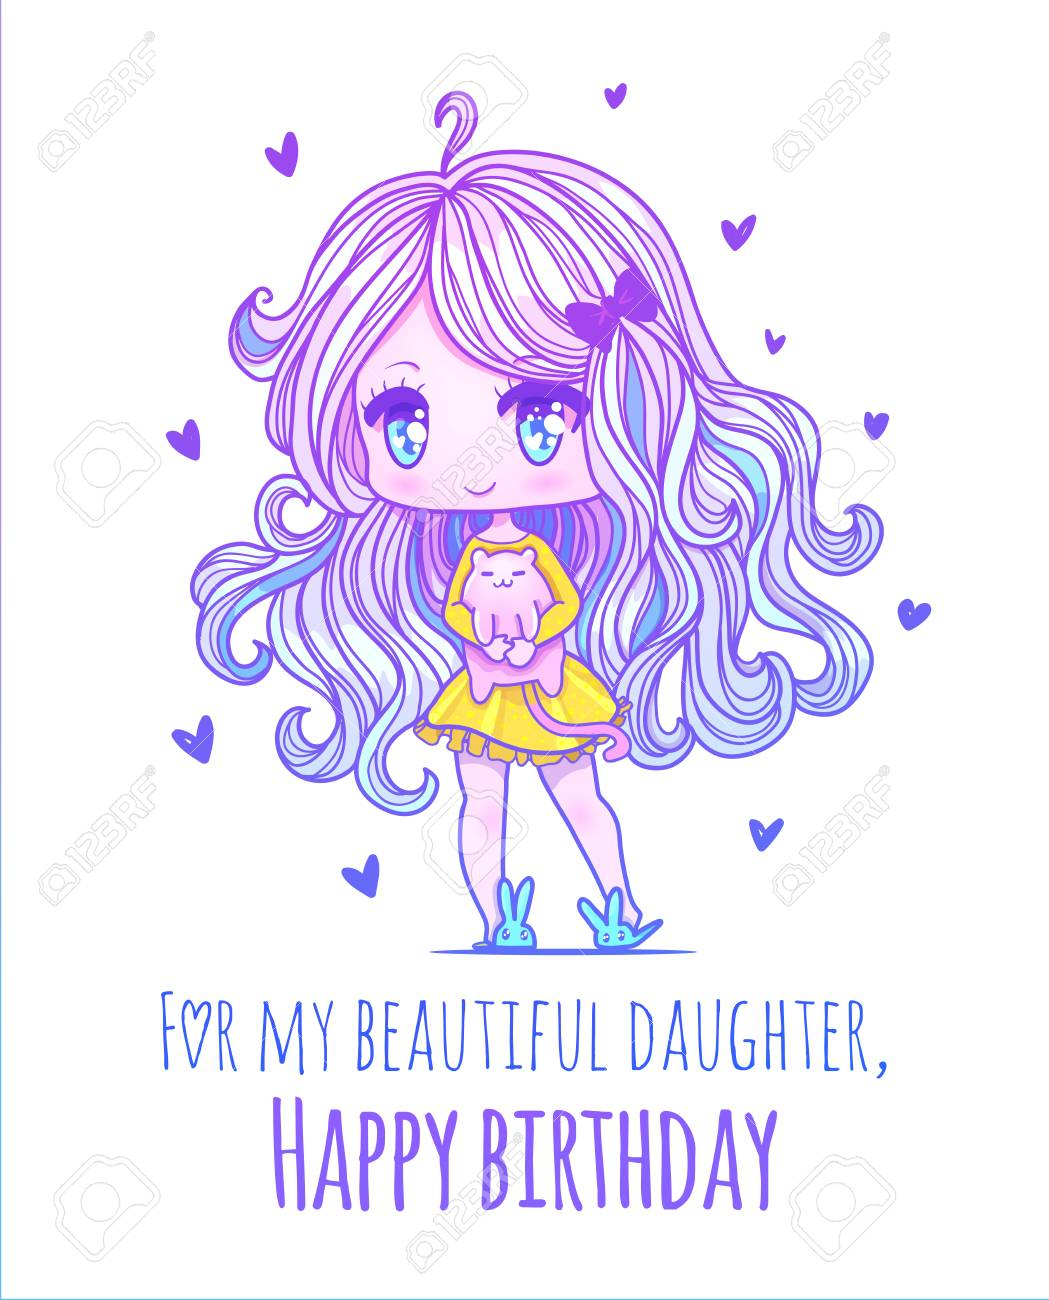 Cute Vector Illustration Kawaii Anime Girl Big Eyes Use For Royalty Free Cliparts Vectors And Stock Illustration Image 92186358